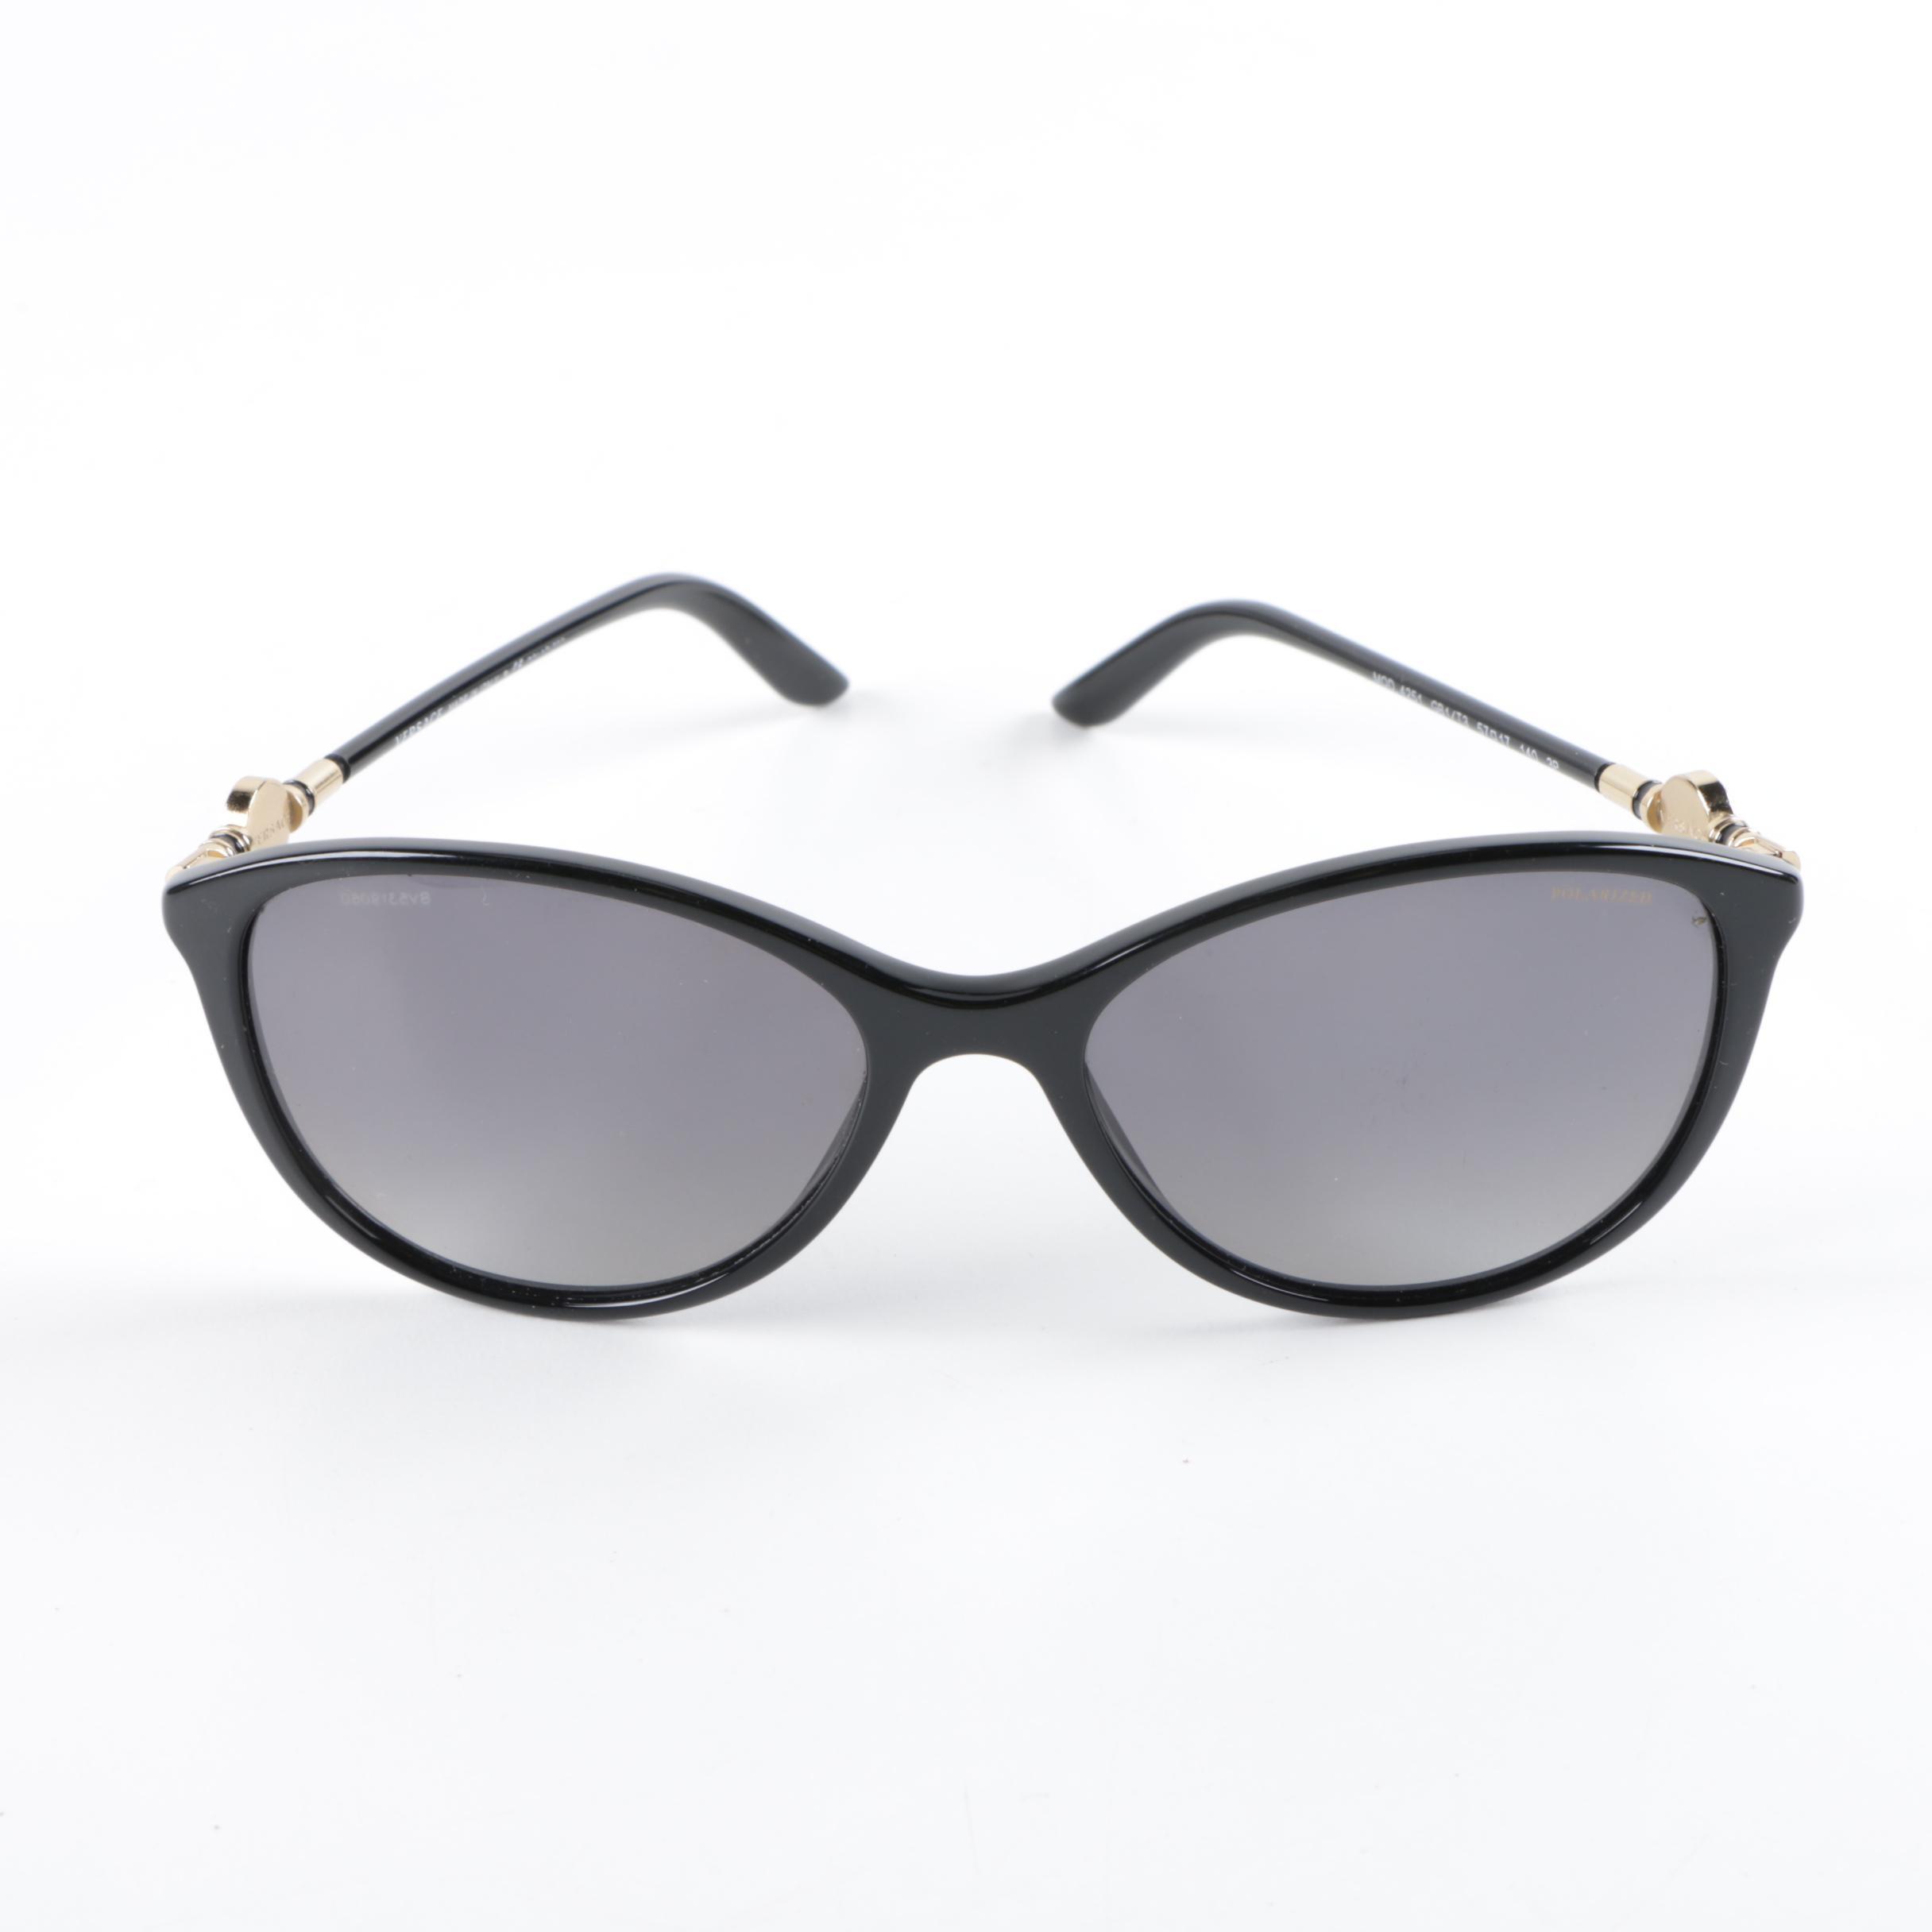 Versace 4251 Black Cat Eye Sunglasses